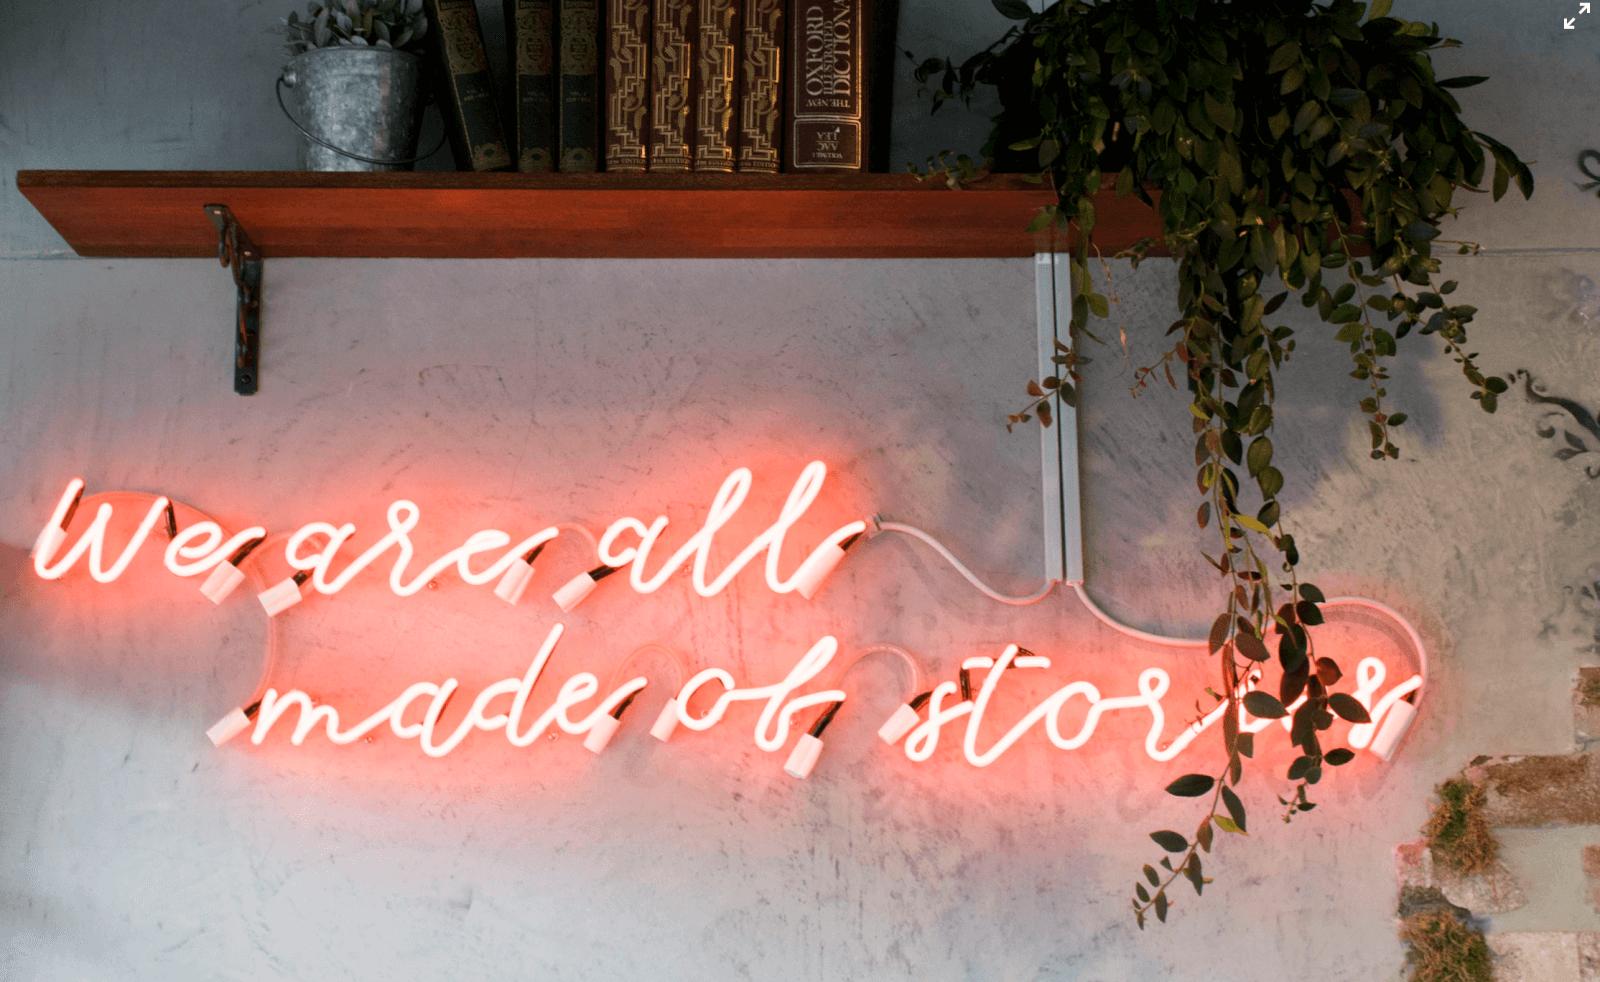 Telling a Story Through Design